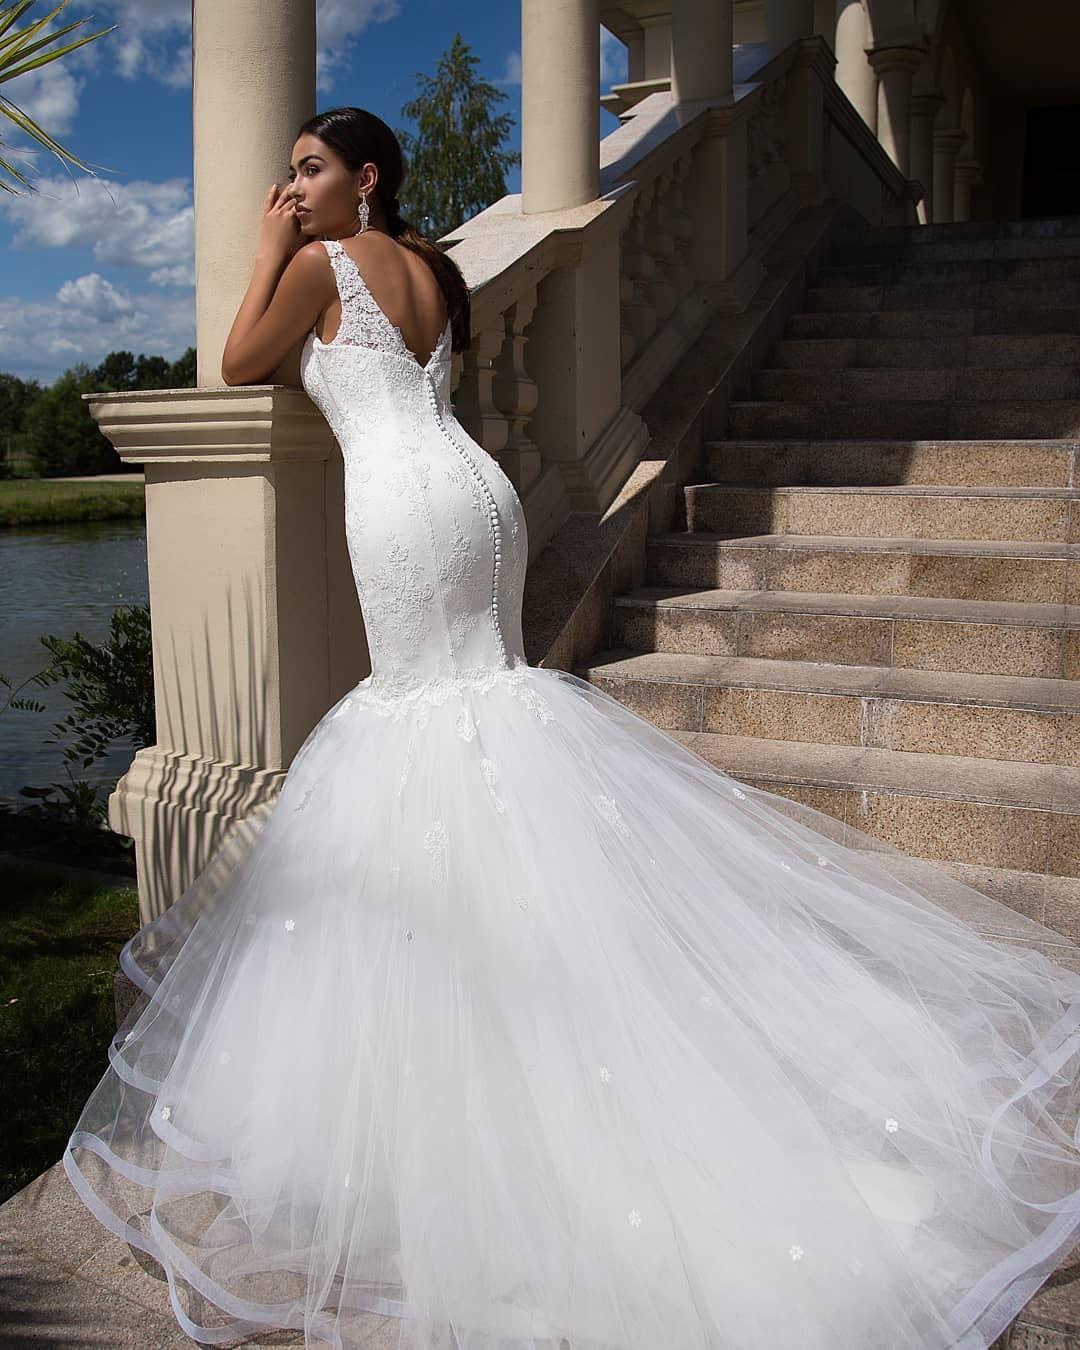 Pin By 166755 On Dress Patterns Dresses Mermaid Wedding Dress Dress Patterns [ 1350 x 1080 Pixel ]